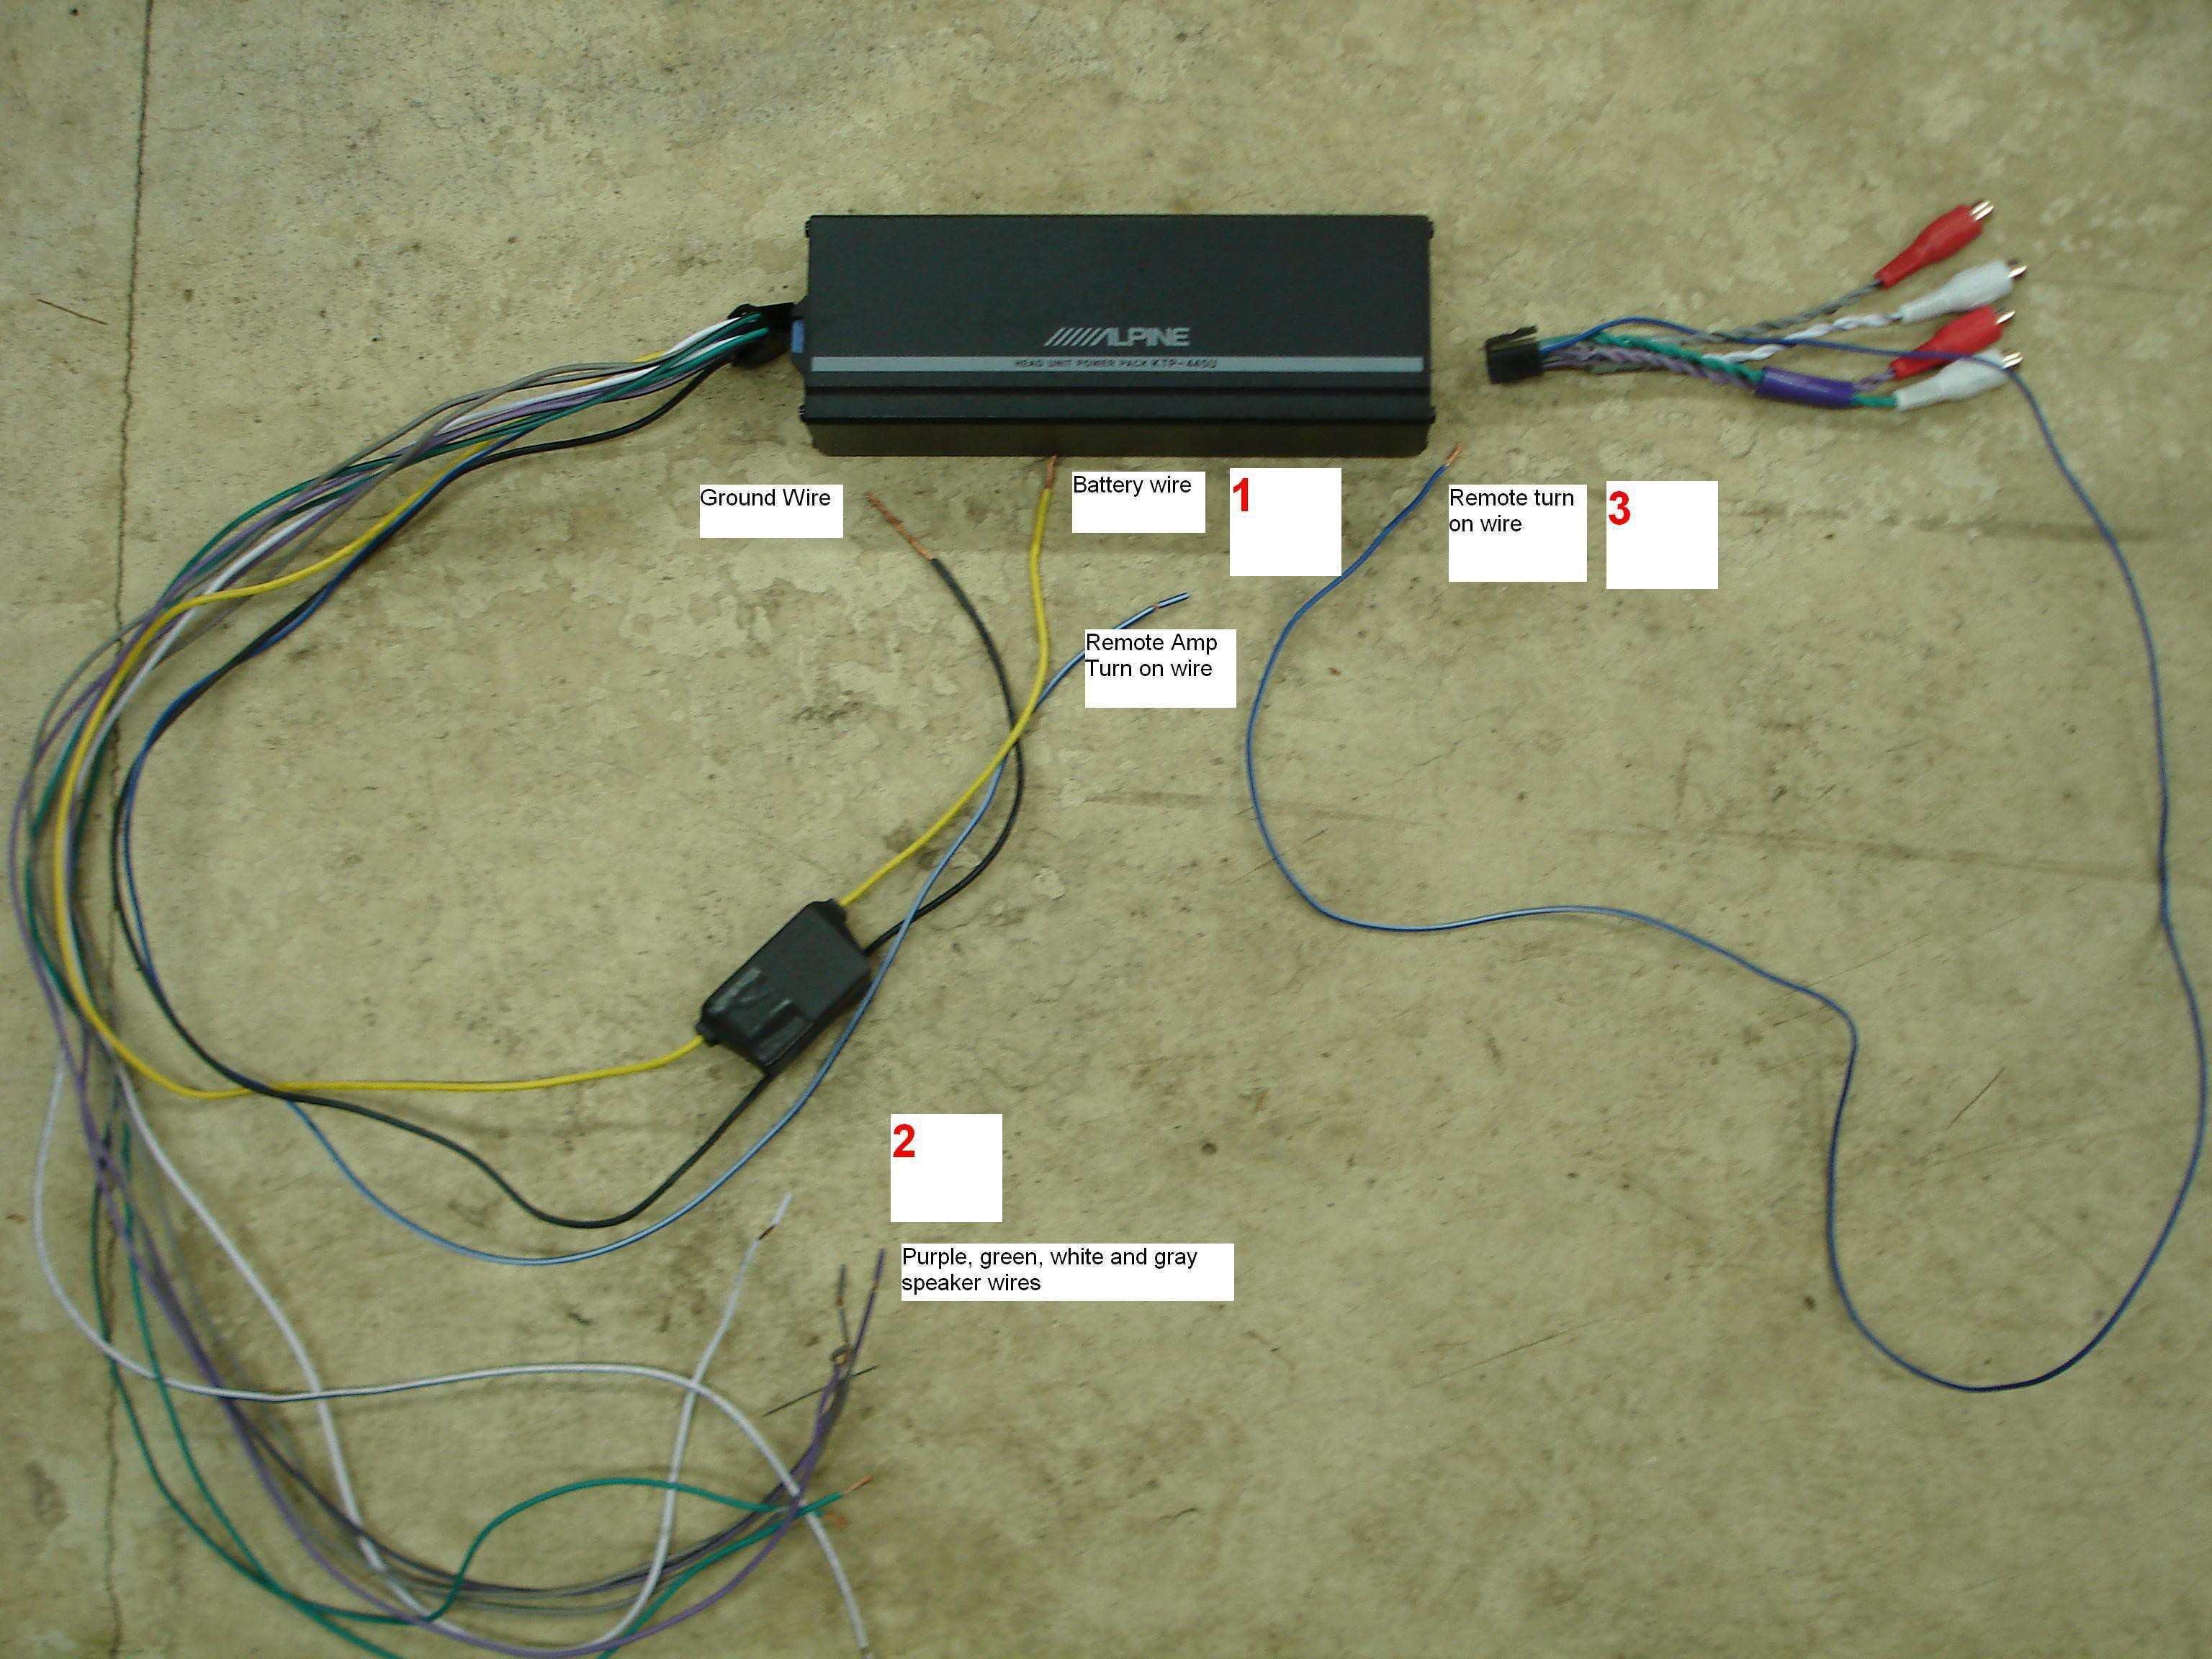 Alpine Cva 1000 Wiring Diagrams | Manual E-Books - Alpine Ktp 445U Wiring Diagram